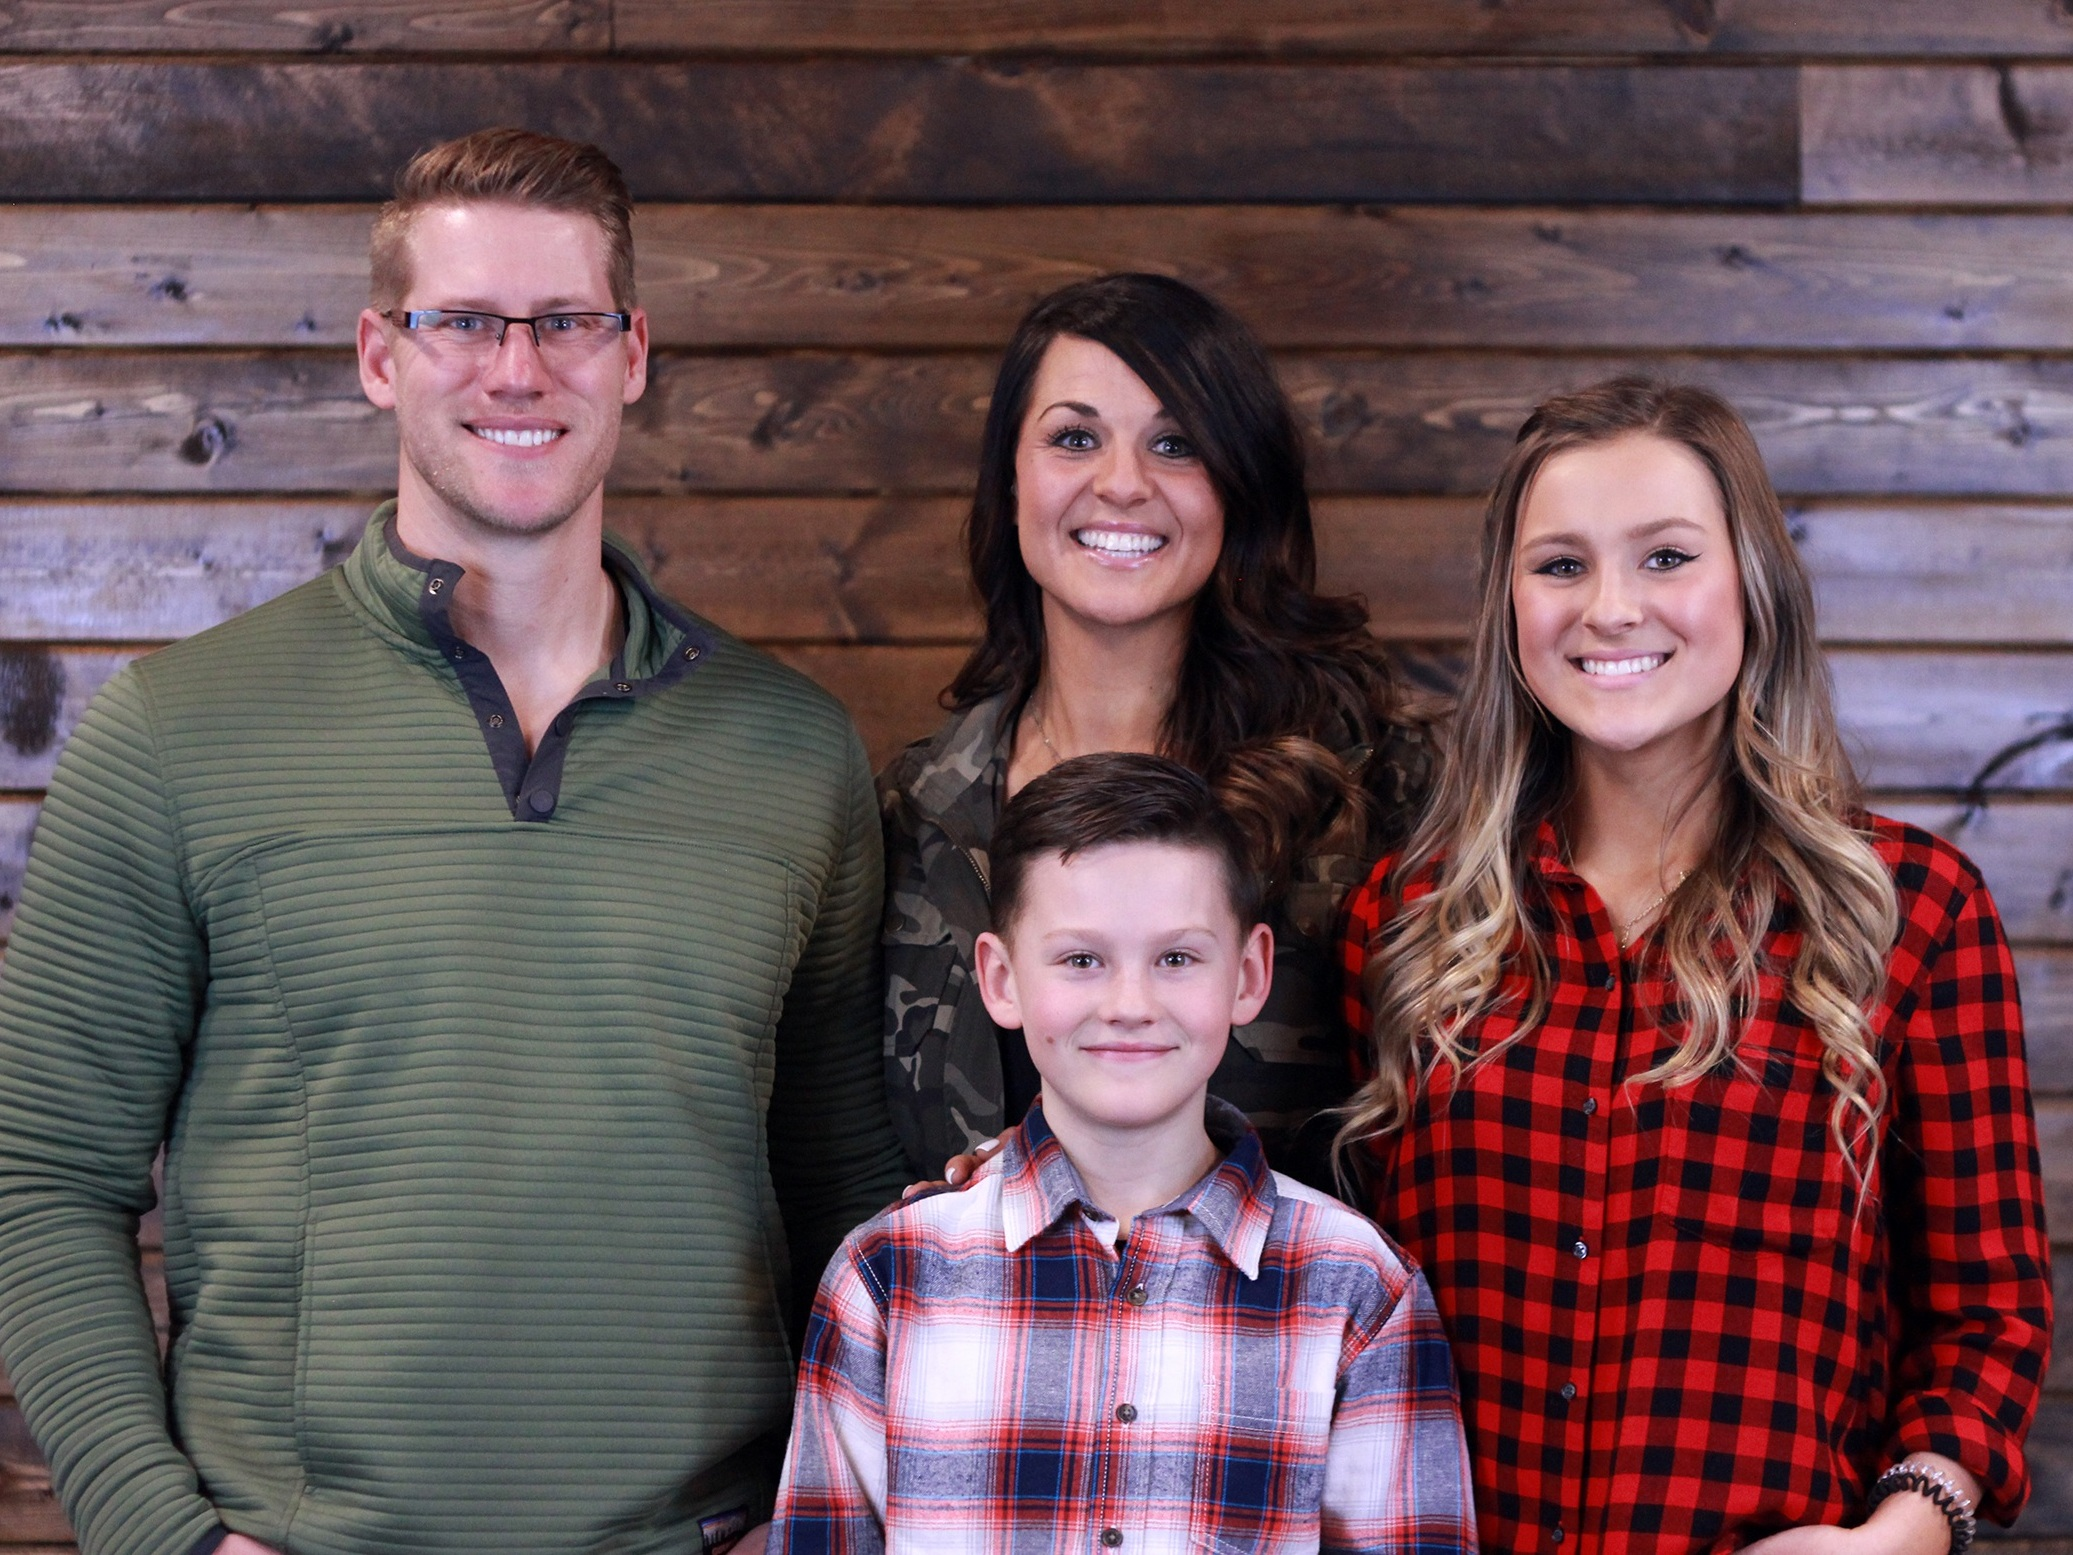 Pastor Seth Koetitz, his wife Katy, and his children: Jackson & Joee